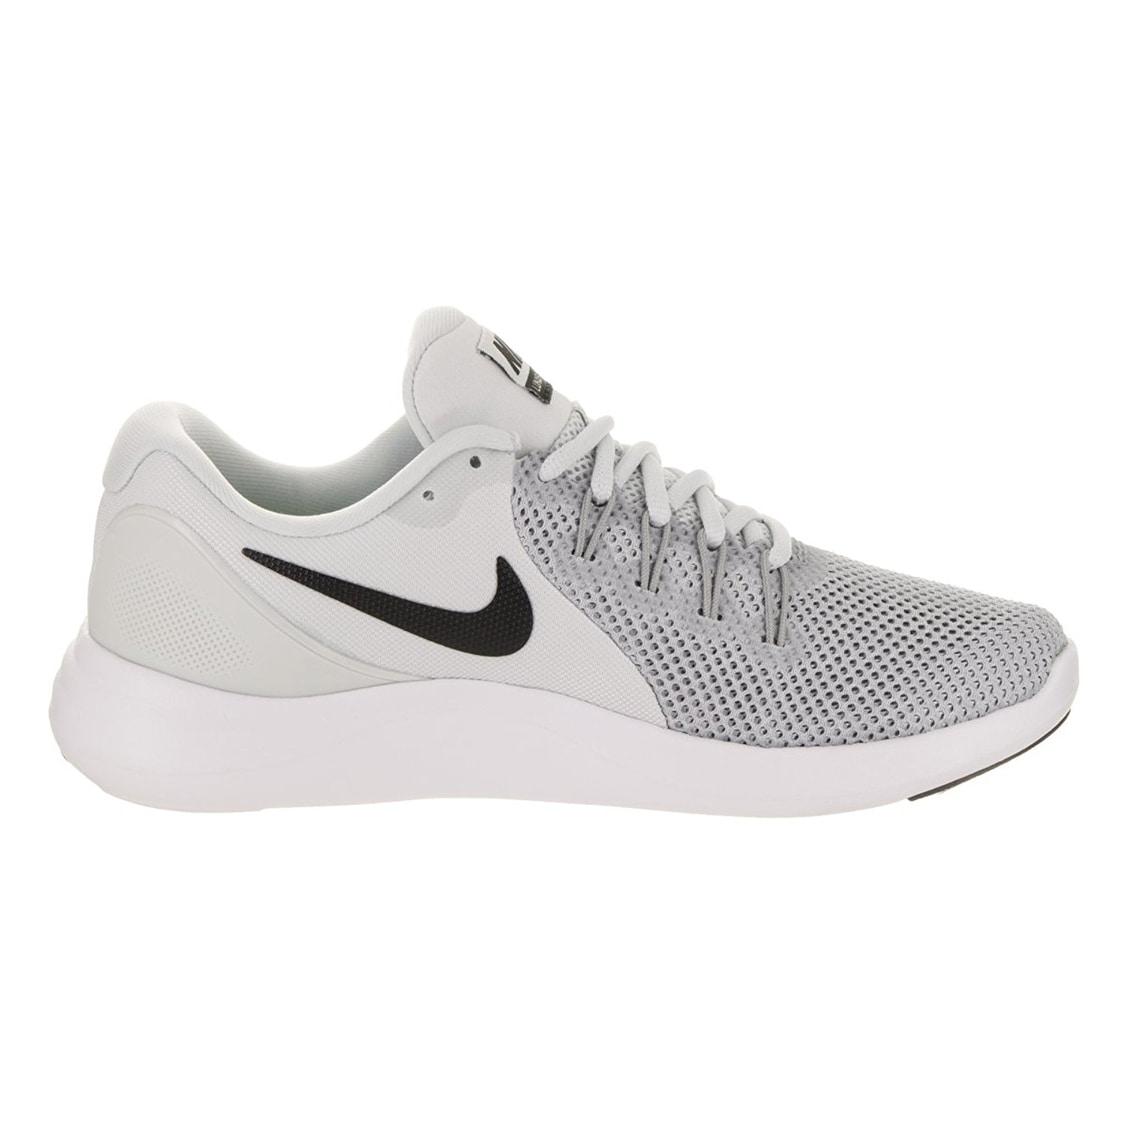 37fd44f4545 Shop Nike Women s Lunar Apparent Pure Platinum Black Wolf Grey Running Shoe  Women - Free Shipping Today - Overstock - 17949983